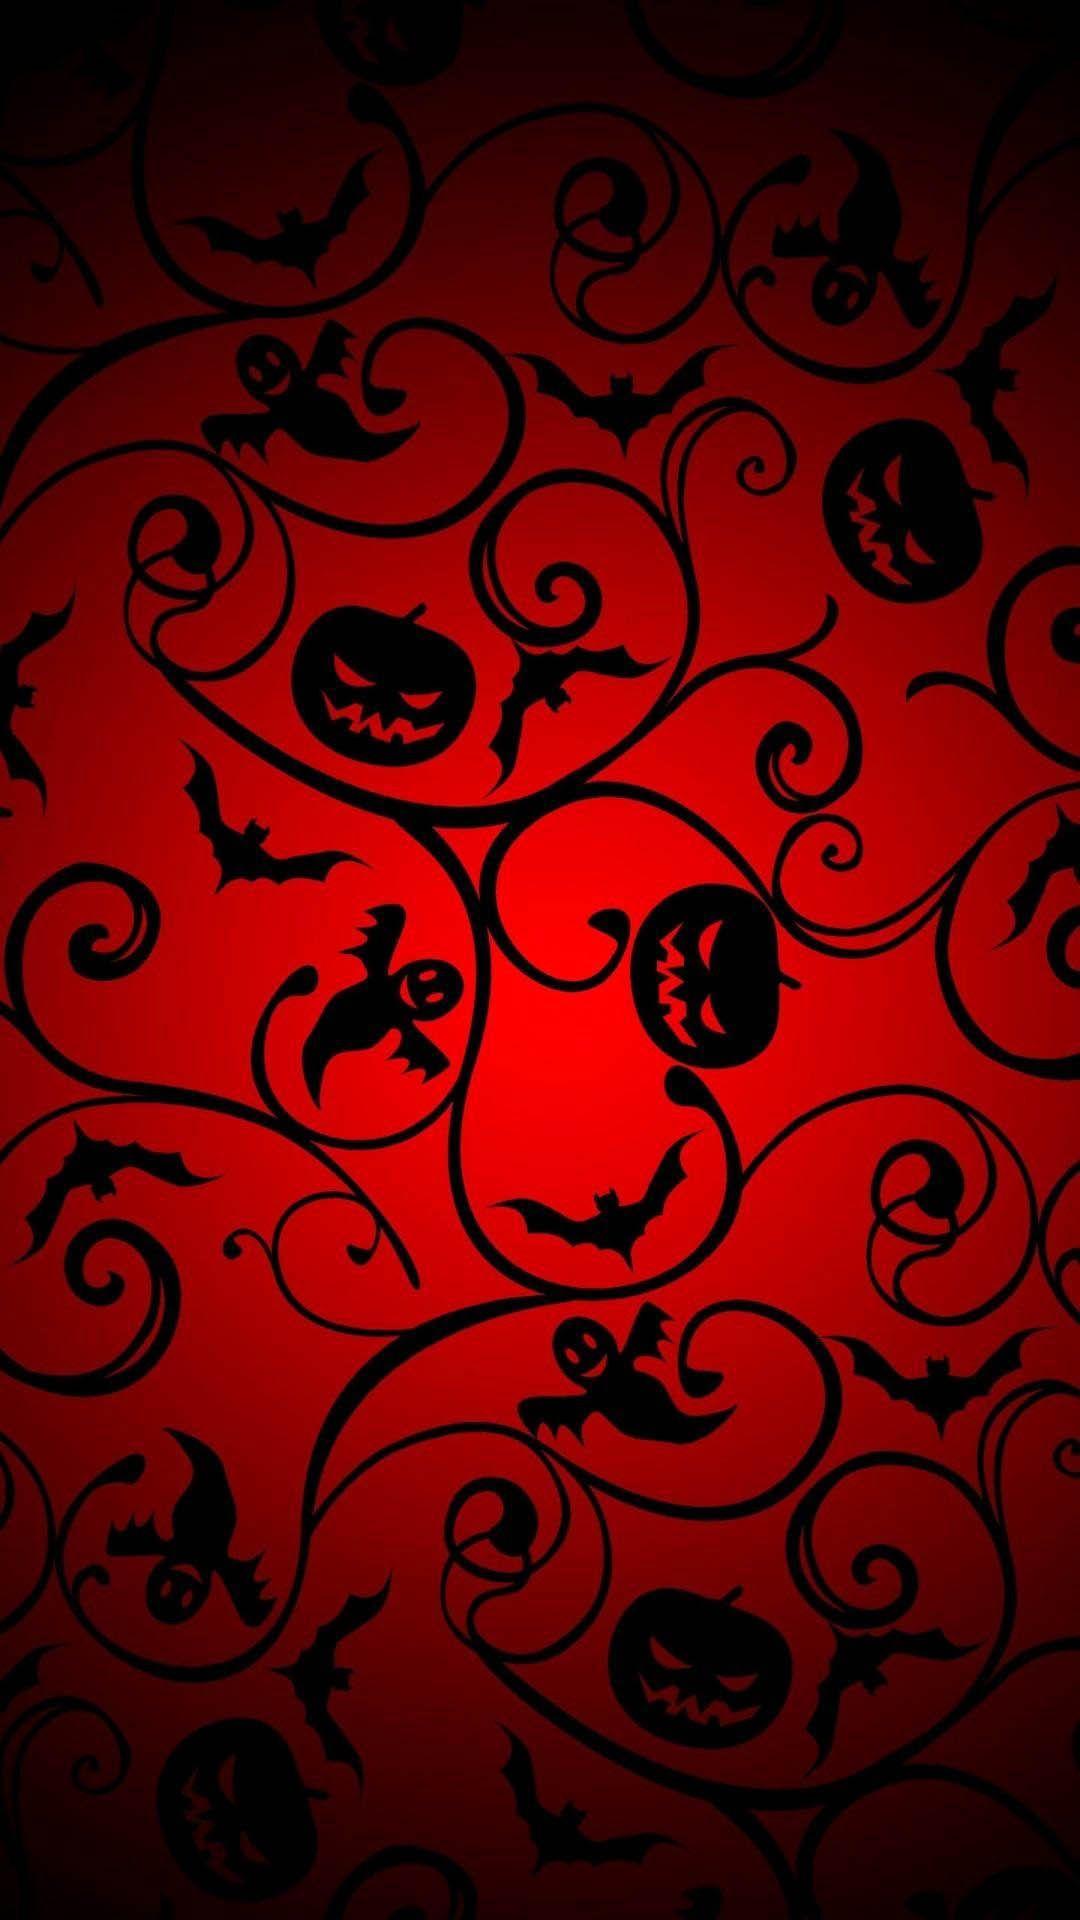 Hd Wallpaper 92 Halloween Wallpaper Iphone Halloween Desktop Wallpaper Android Wallpaper